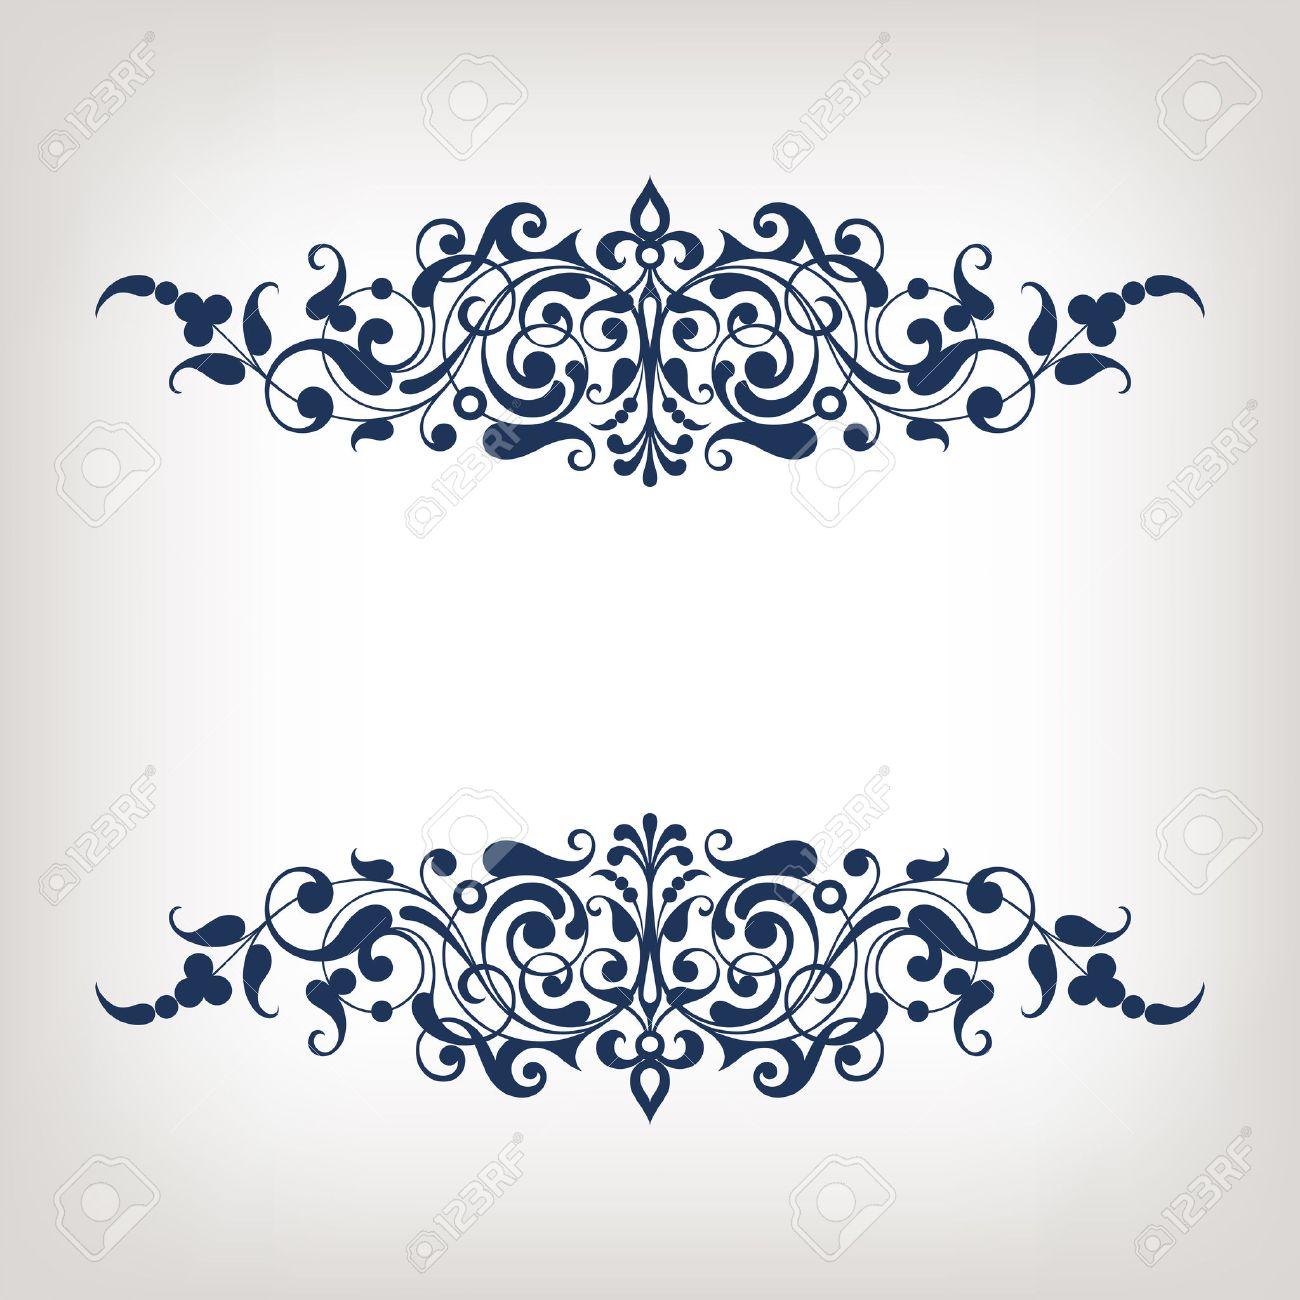 vector vintage ornate border frame filigree with retro ornament pattern in antique baroque style arabic decorative calligraphy design - 27560756